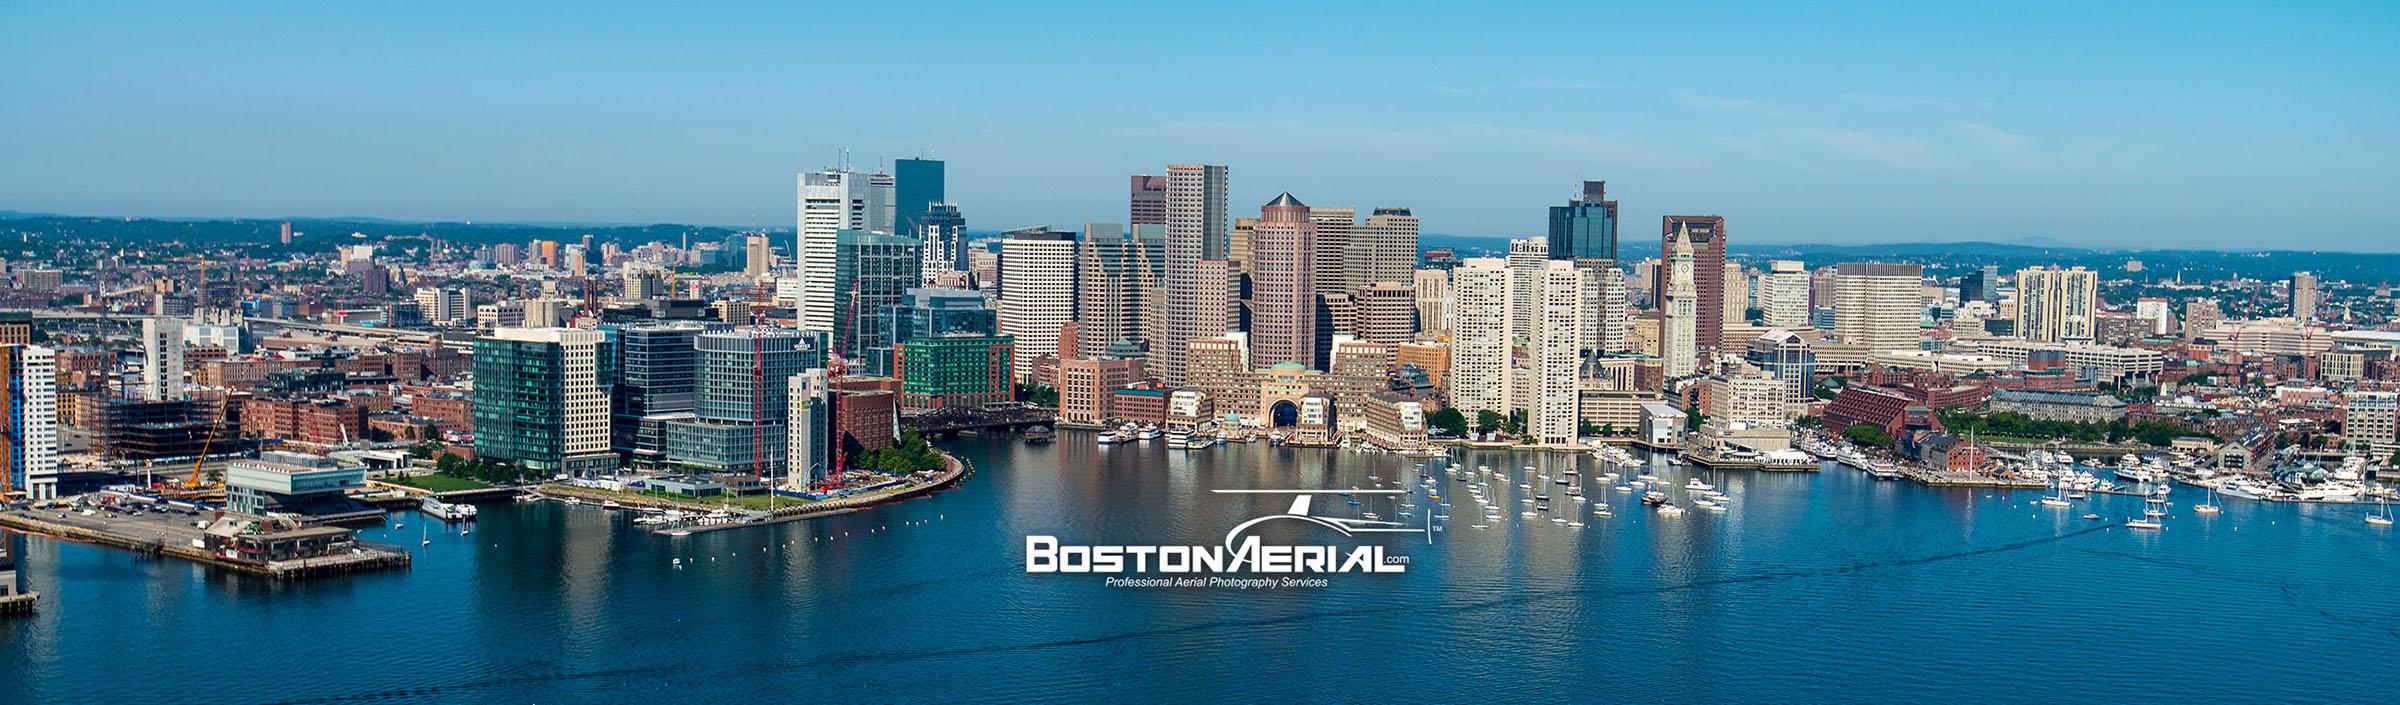 boston aerial photographer